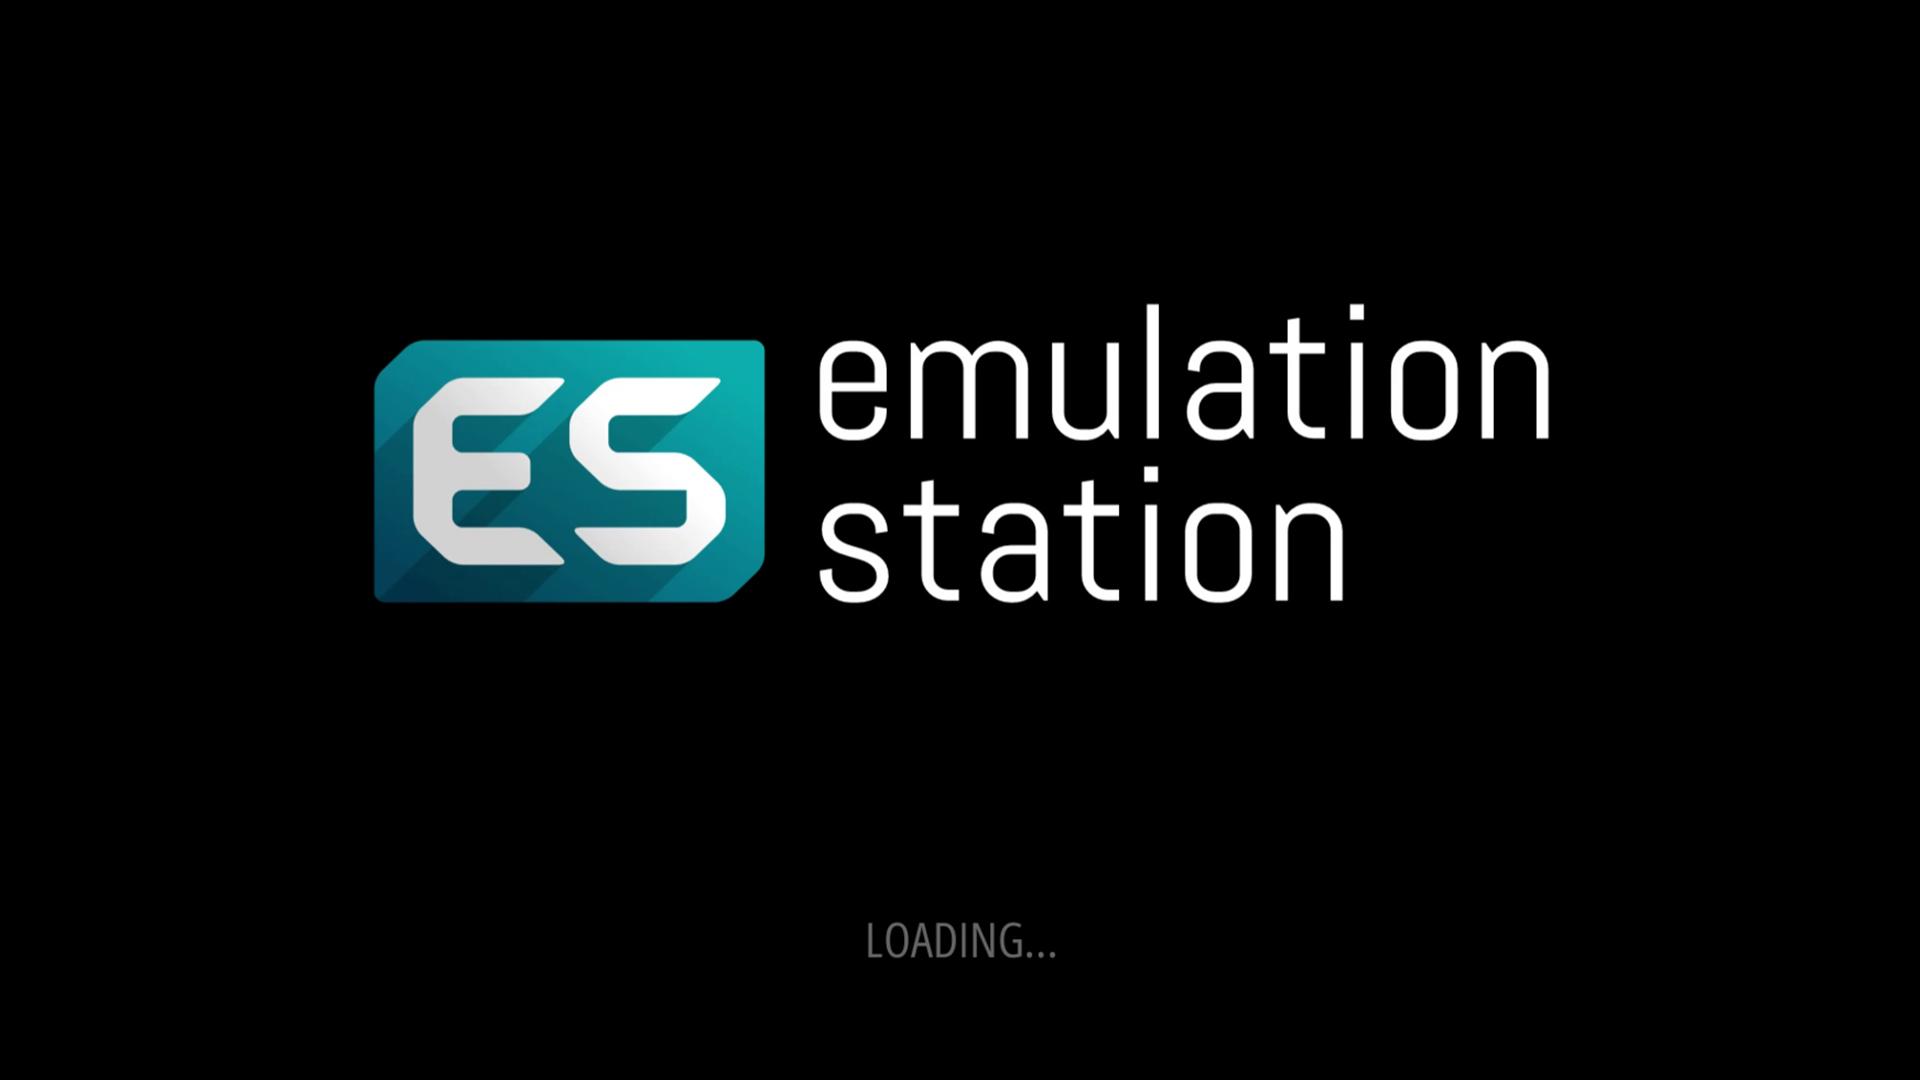 DigitaleWelt RetroPie Anleitung - emulation station loading